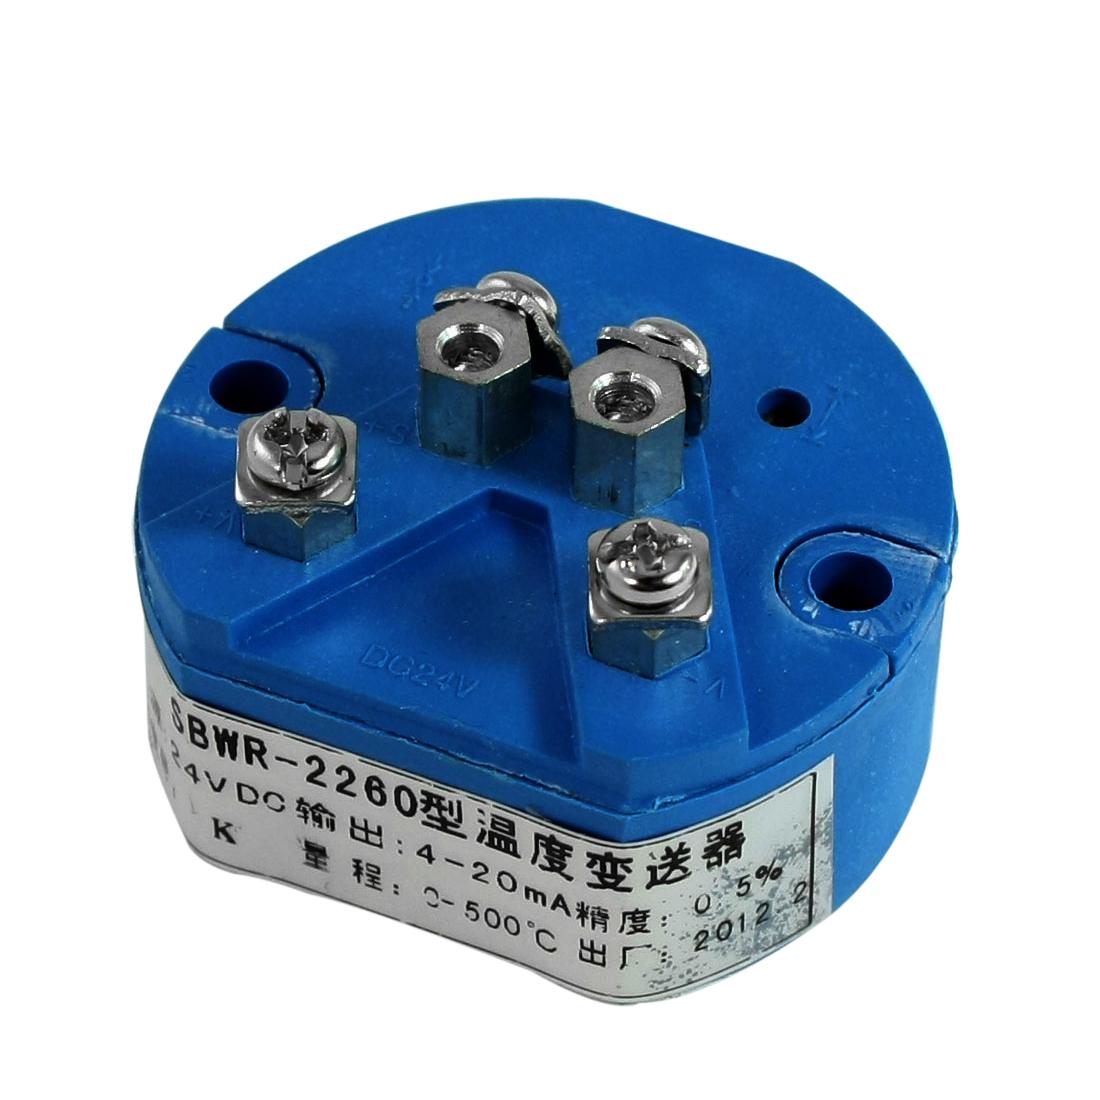 K Type Thermocouple Temperature Sensor Transmitter 0-500C 24VDC